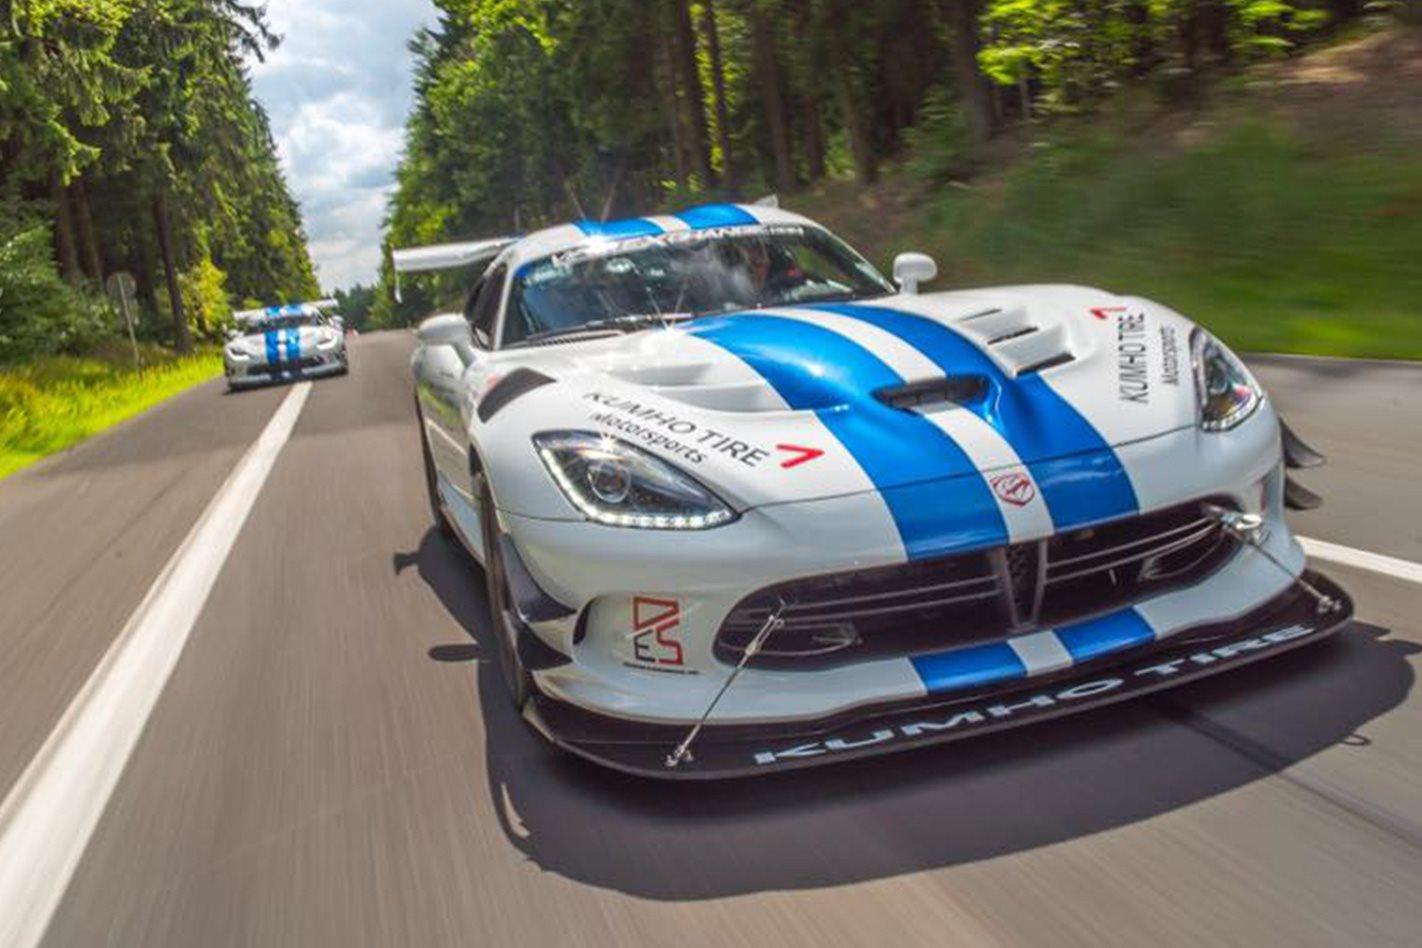 Dodge Viper ACR Nürburgring lap